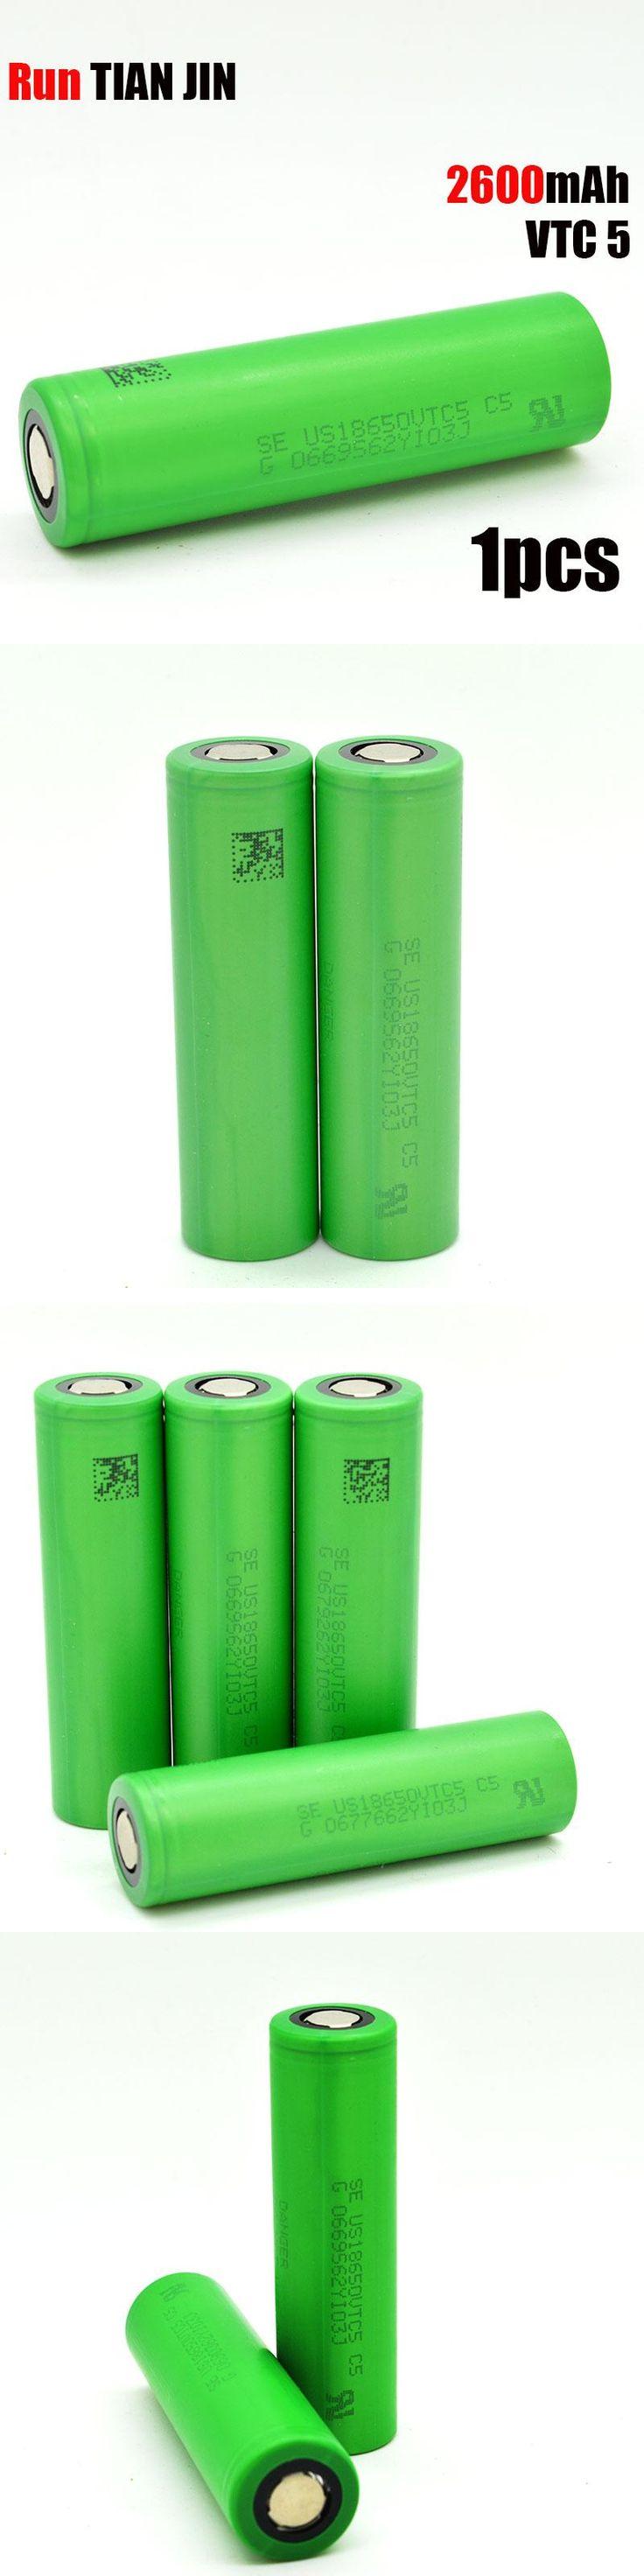 1PCS 18650 battery  100% original  Echtes Version 3.6 V 18650 US18650 VTC5 2600 mAh 30A E-cig batterie  Freies verschiffen